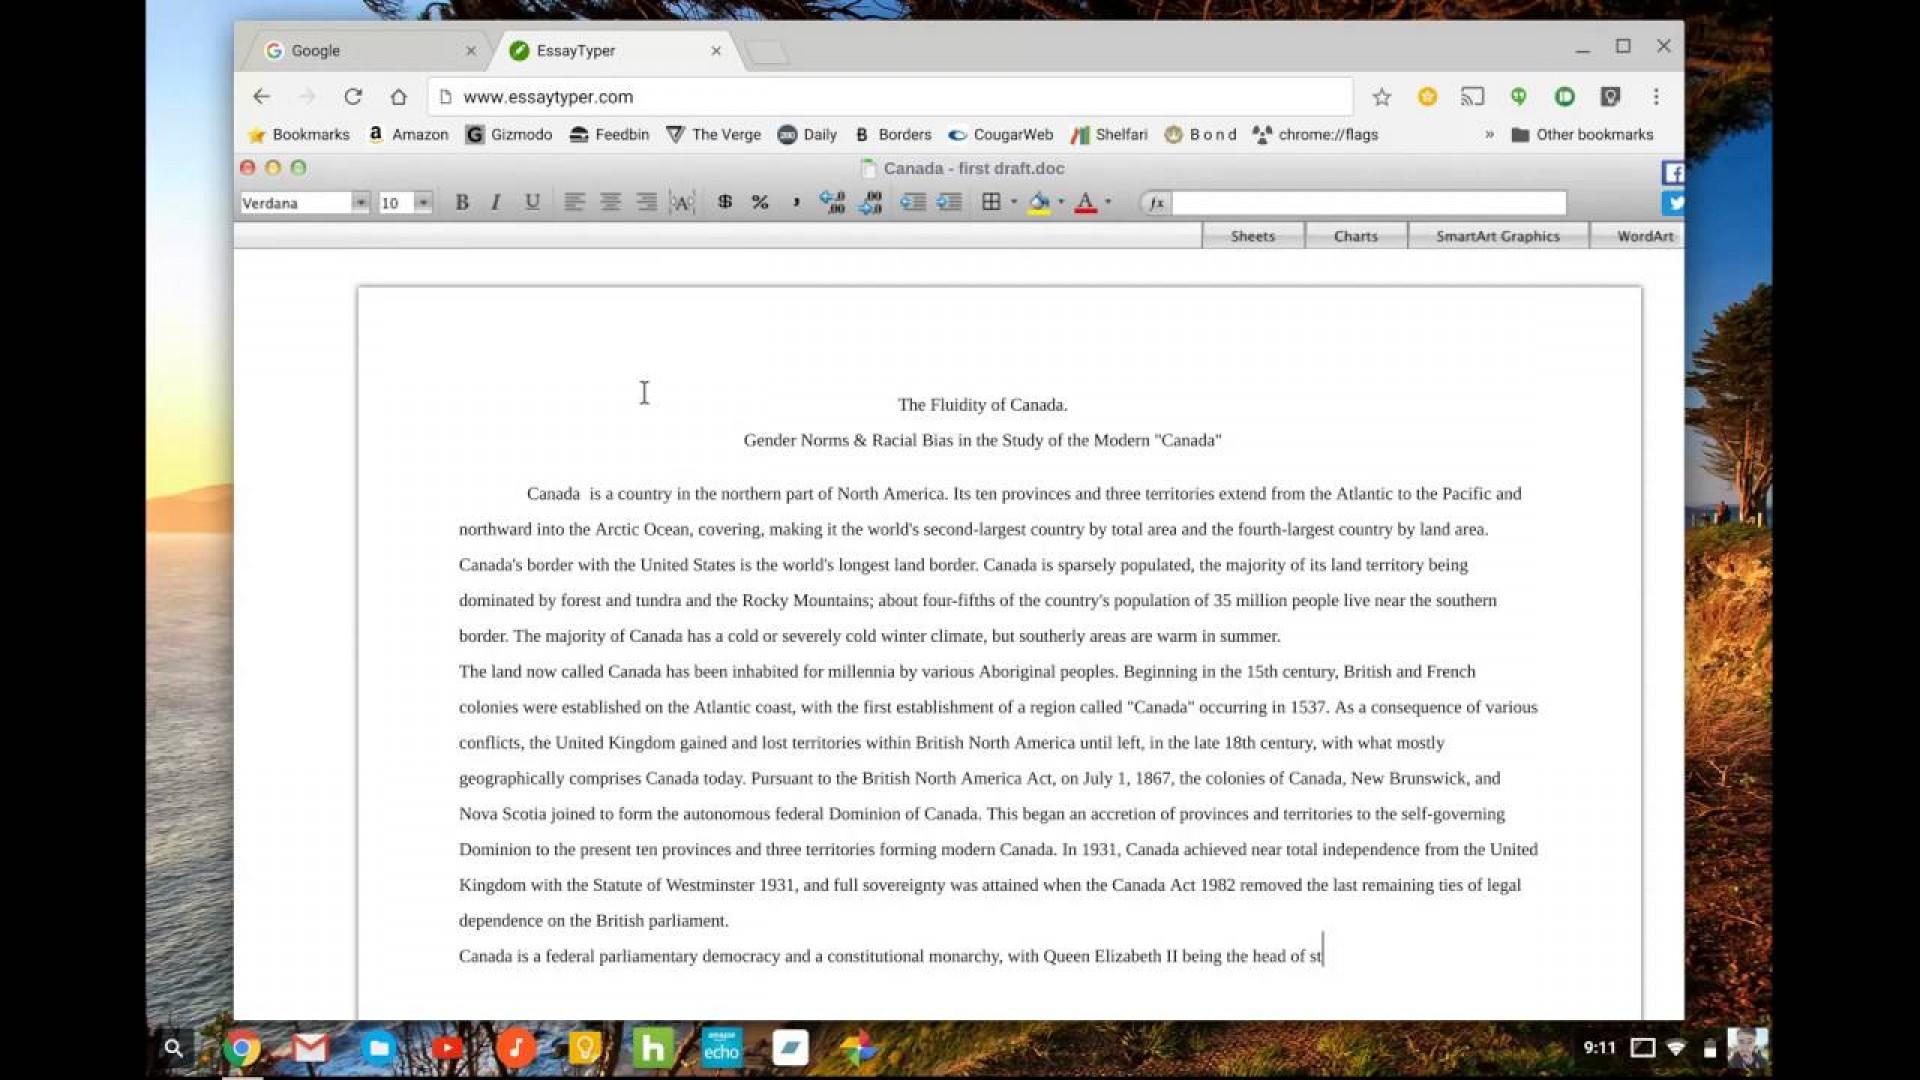 003 Essay Typer Com Example Stirring Comparative How To Use Essaytyper.com Unblocked 1920